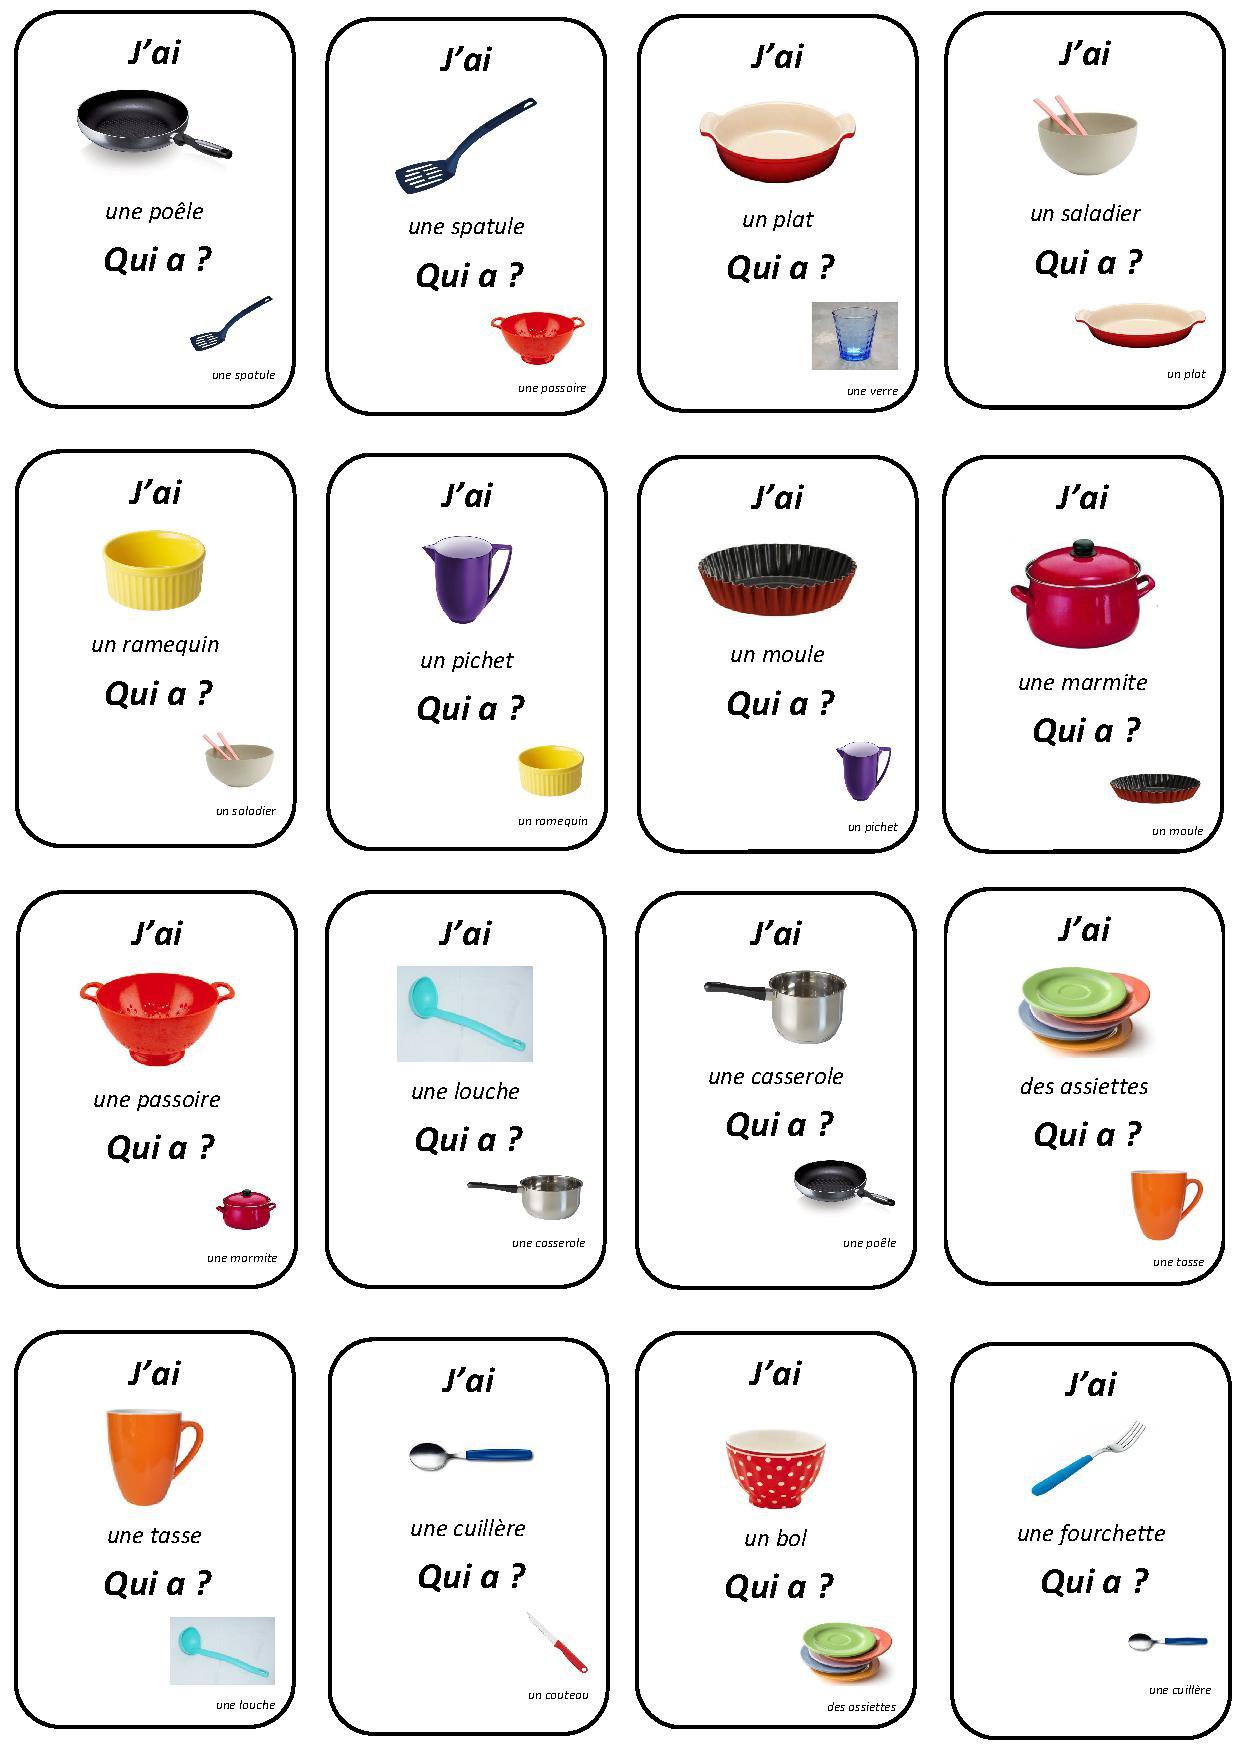 Top Les Ustensiles De La Cuisine - Lessons - Tes Teach AQ68